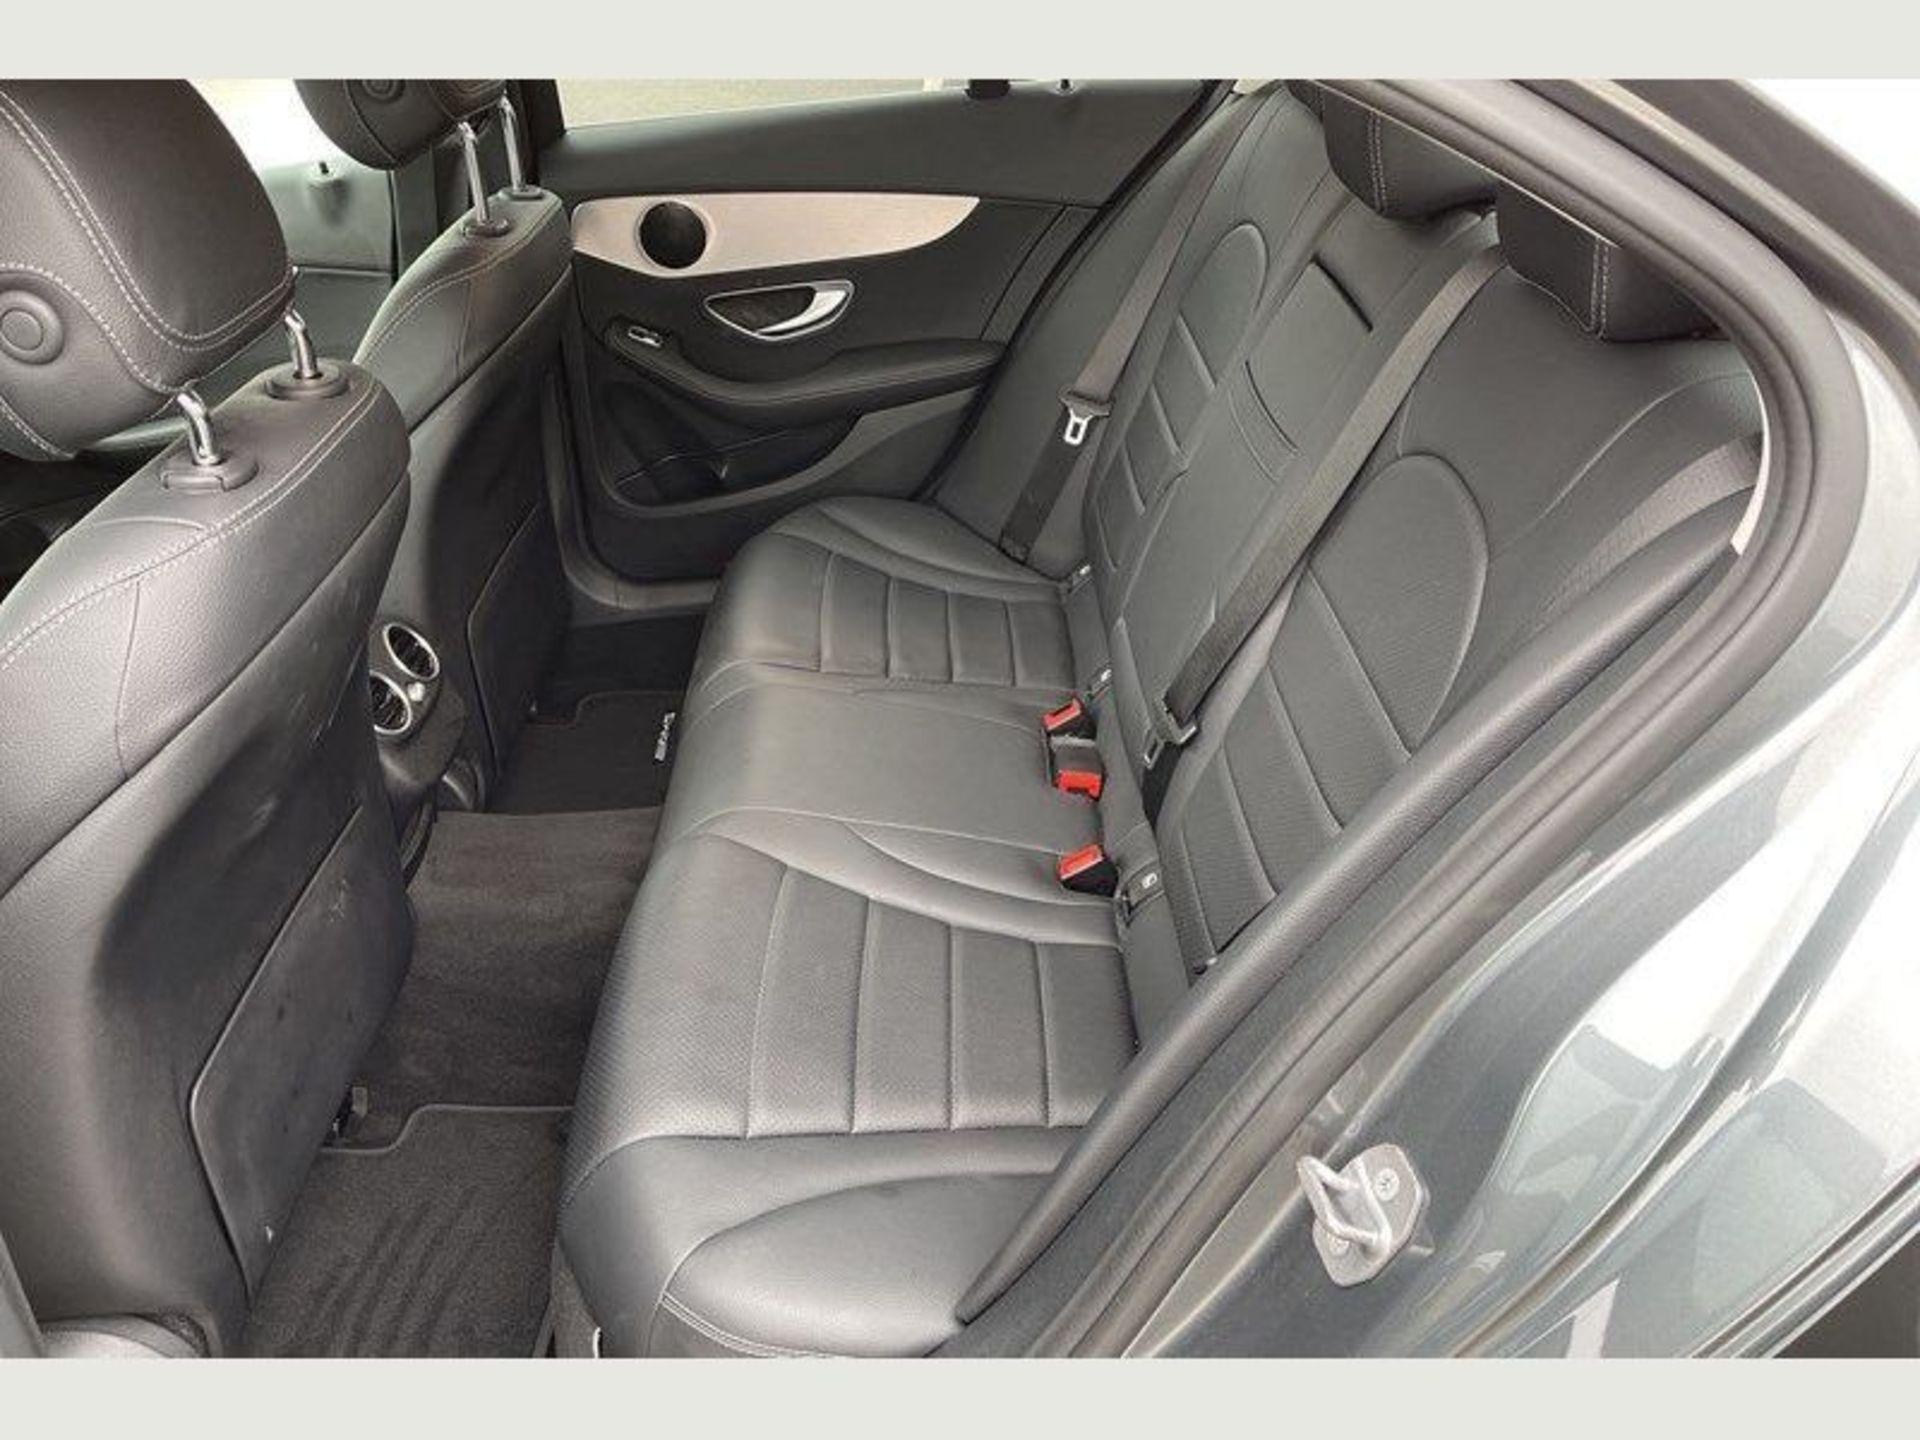 (Reserve Met) Mercedes C220d Sport - 9G Tronic Auto - 188BHP - 2019 Reg - Reversing Cam - Sat Nav - - Image 6 of 7